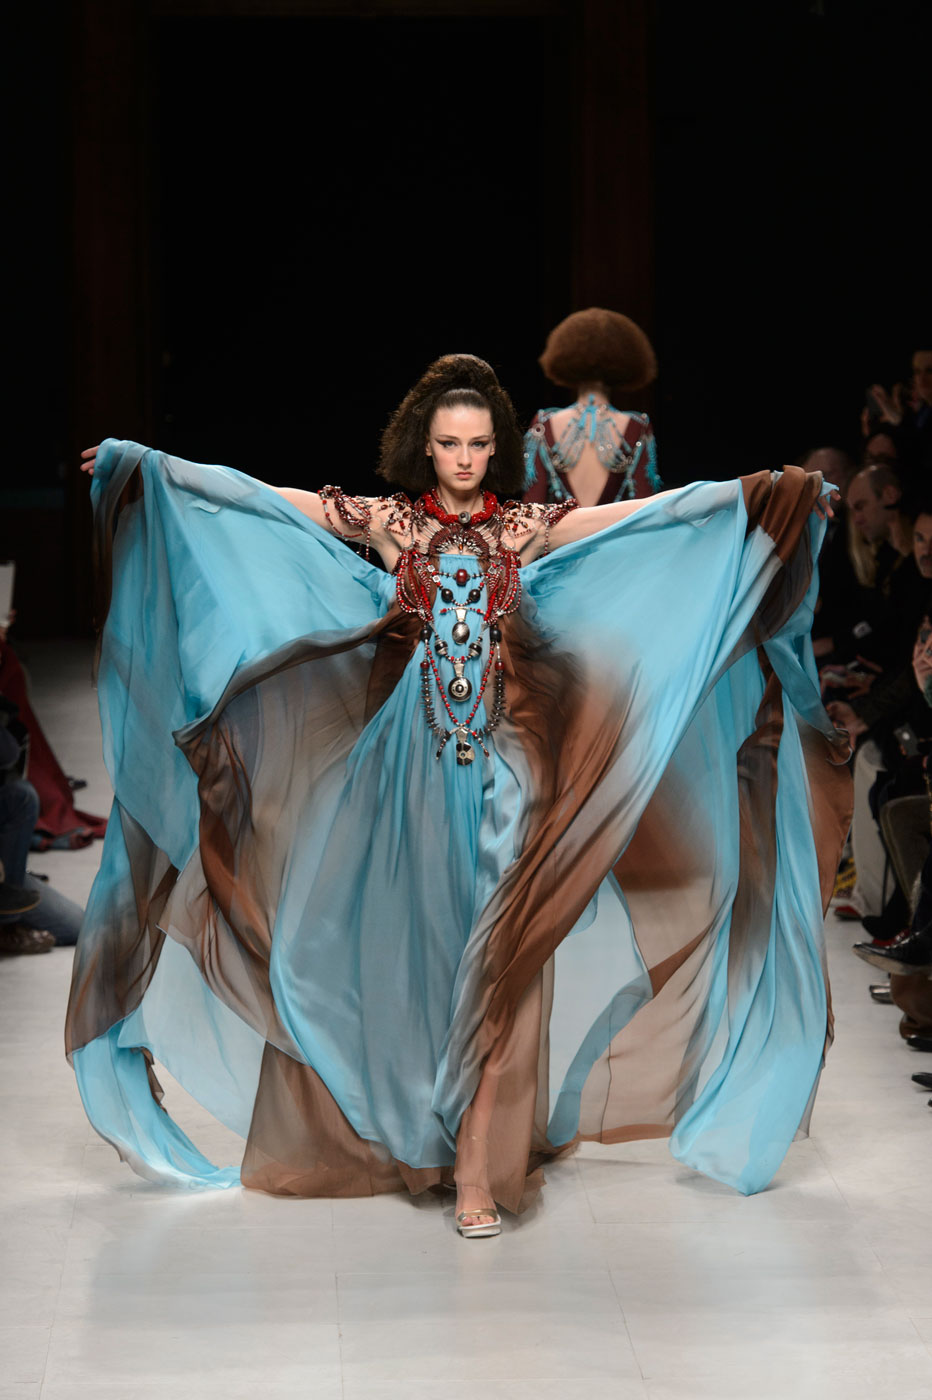 Julien-Fournie-Prive-fashion-runway-show-haute-couture-paris-spring-2015-the-impression-51